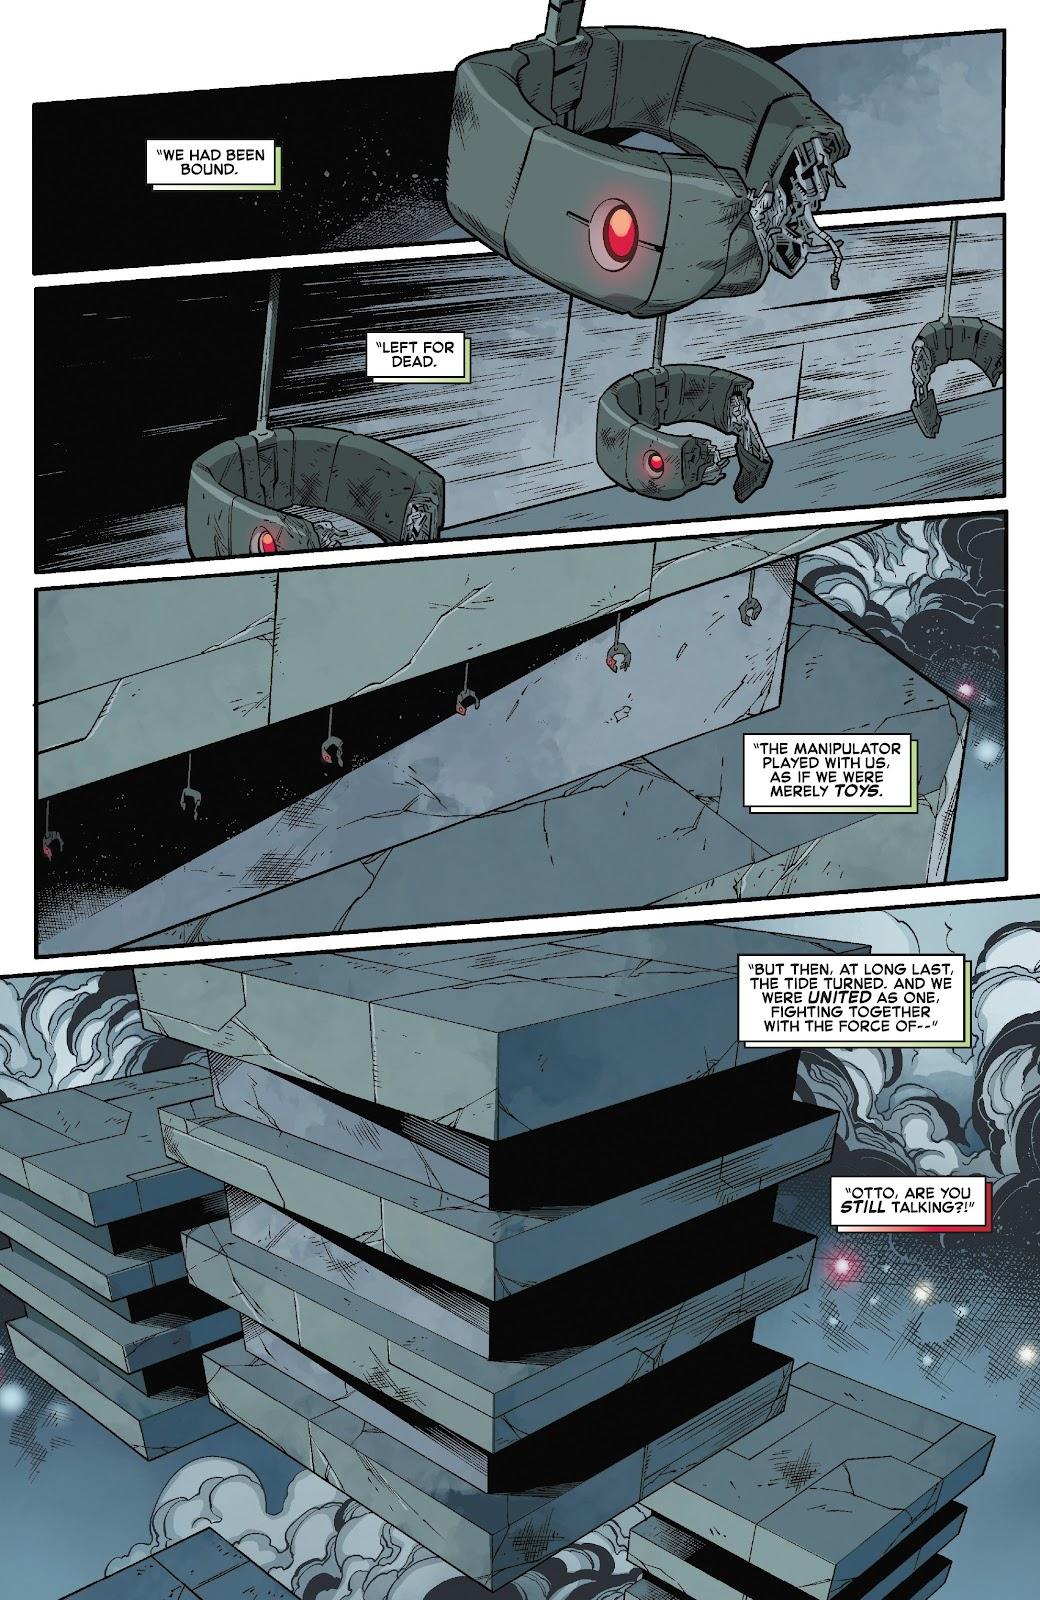 Read online Spider-Man/Deadpool comic -  Issue #49 - 3